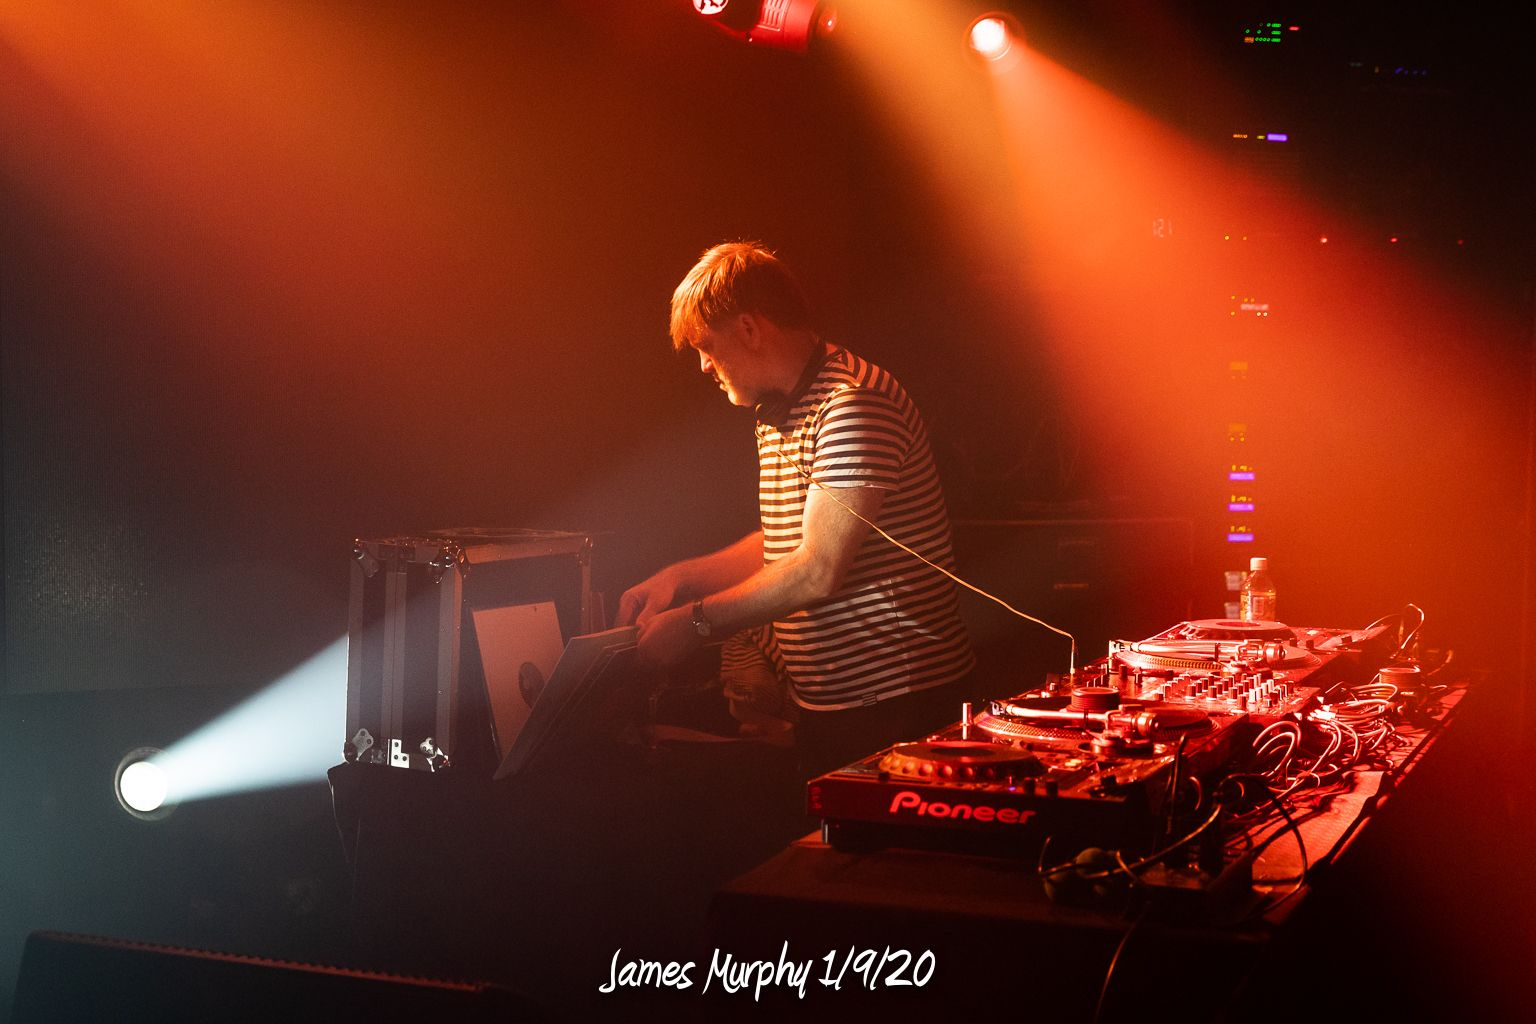 James Murphy 1/9/20